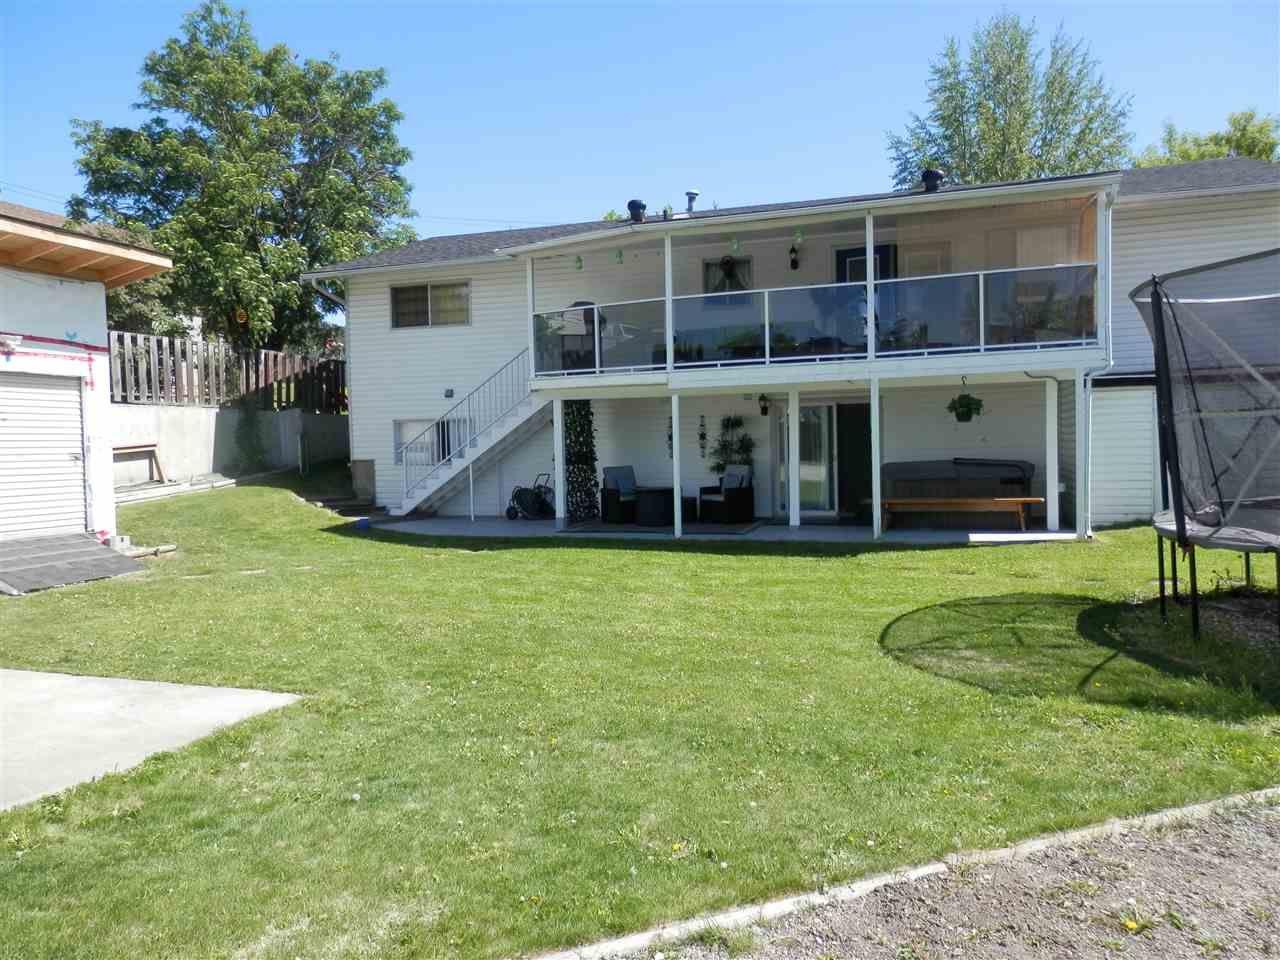 Photo 22: Photos: 783 PIGEON Avenue in Williams Lake: Williams Lake - City House for sale (Williams Lake (Zone 27))  : MLS®# R2459919